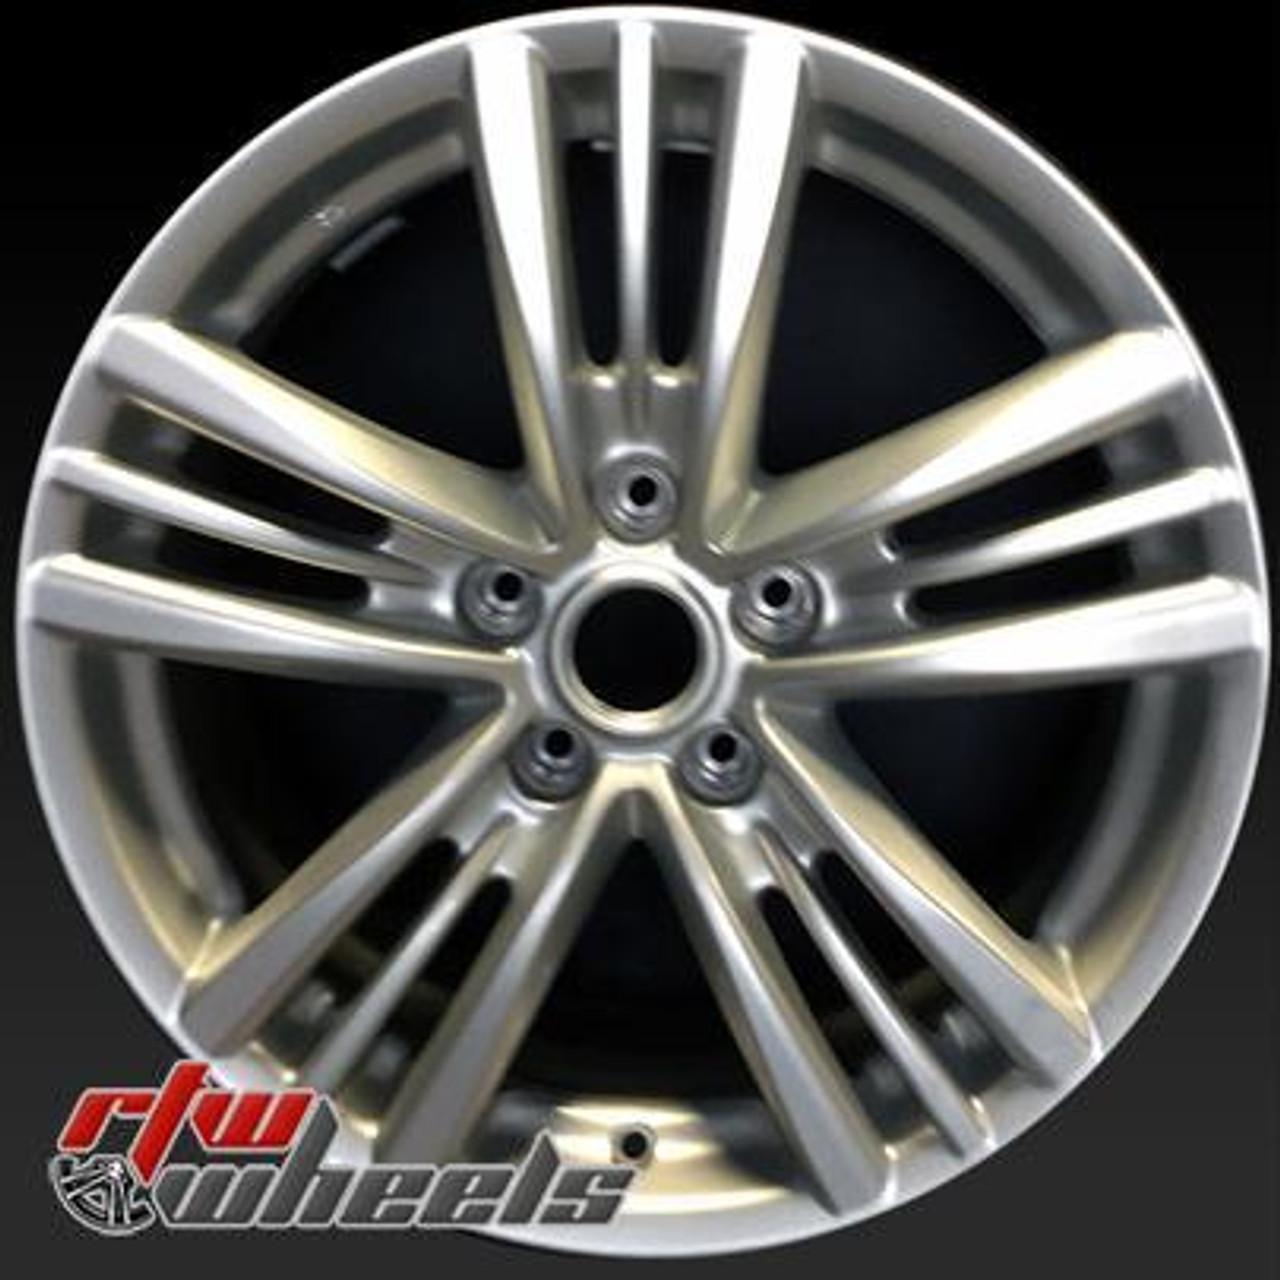 Infiniti G37 Wheels